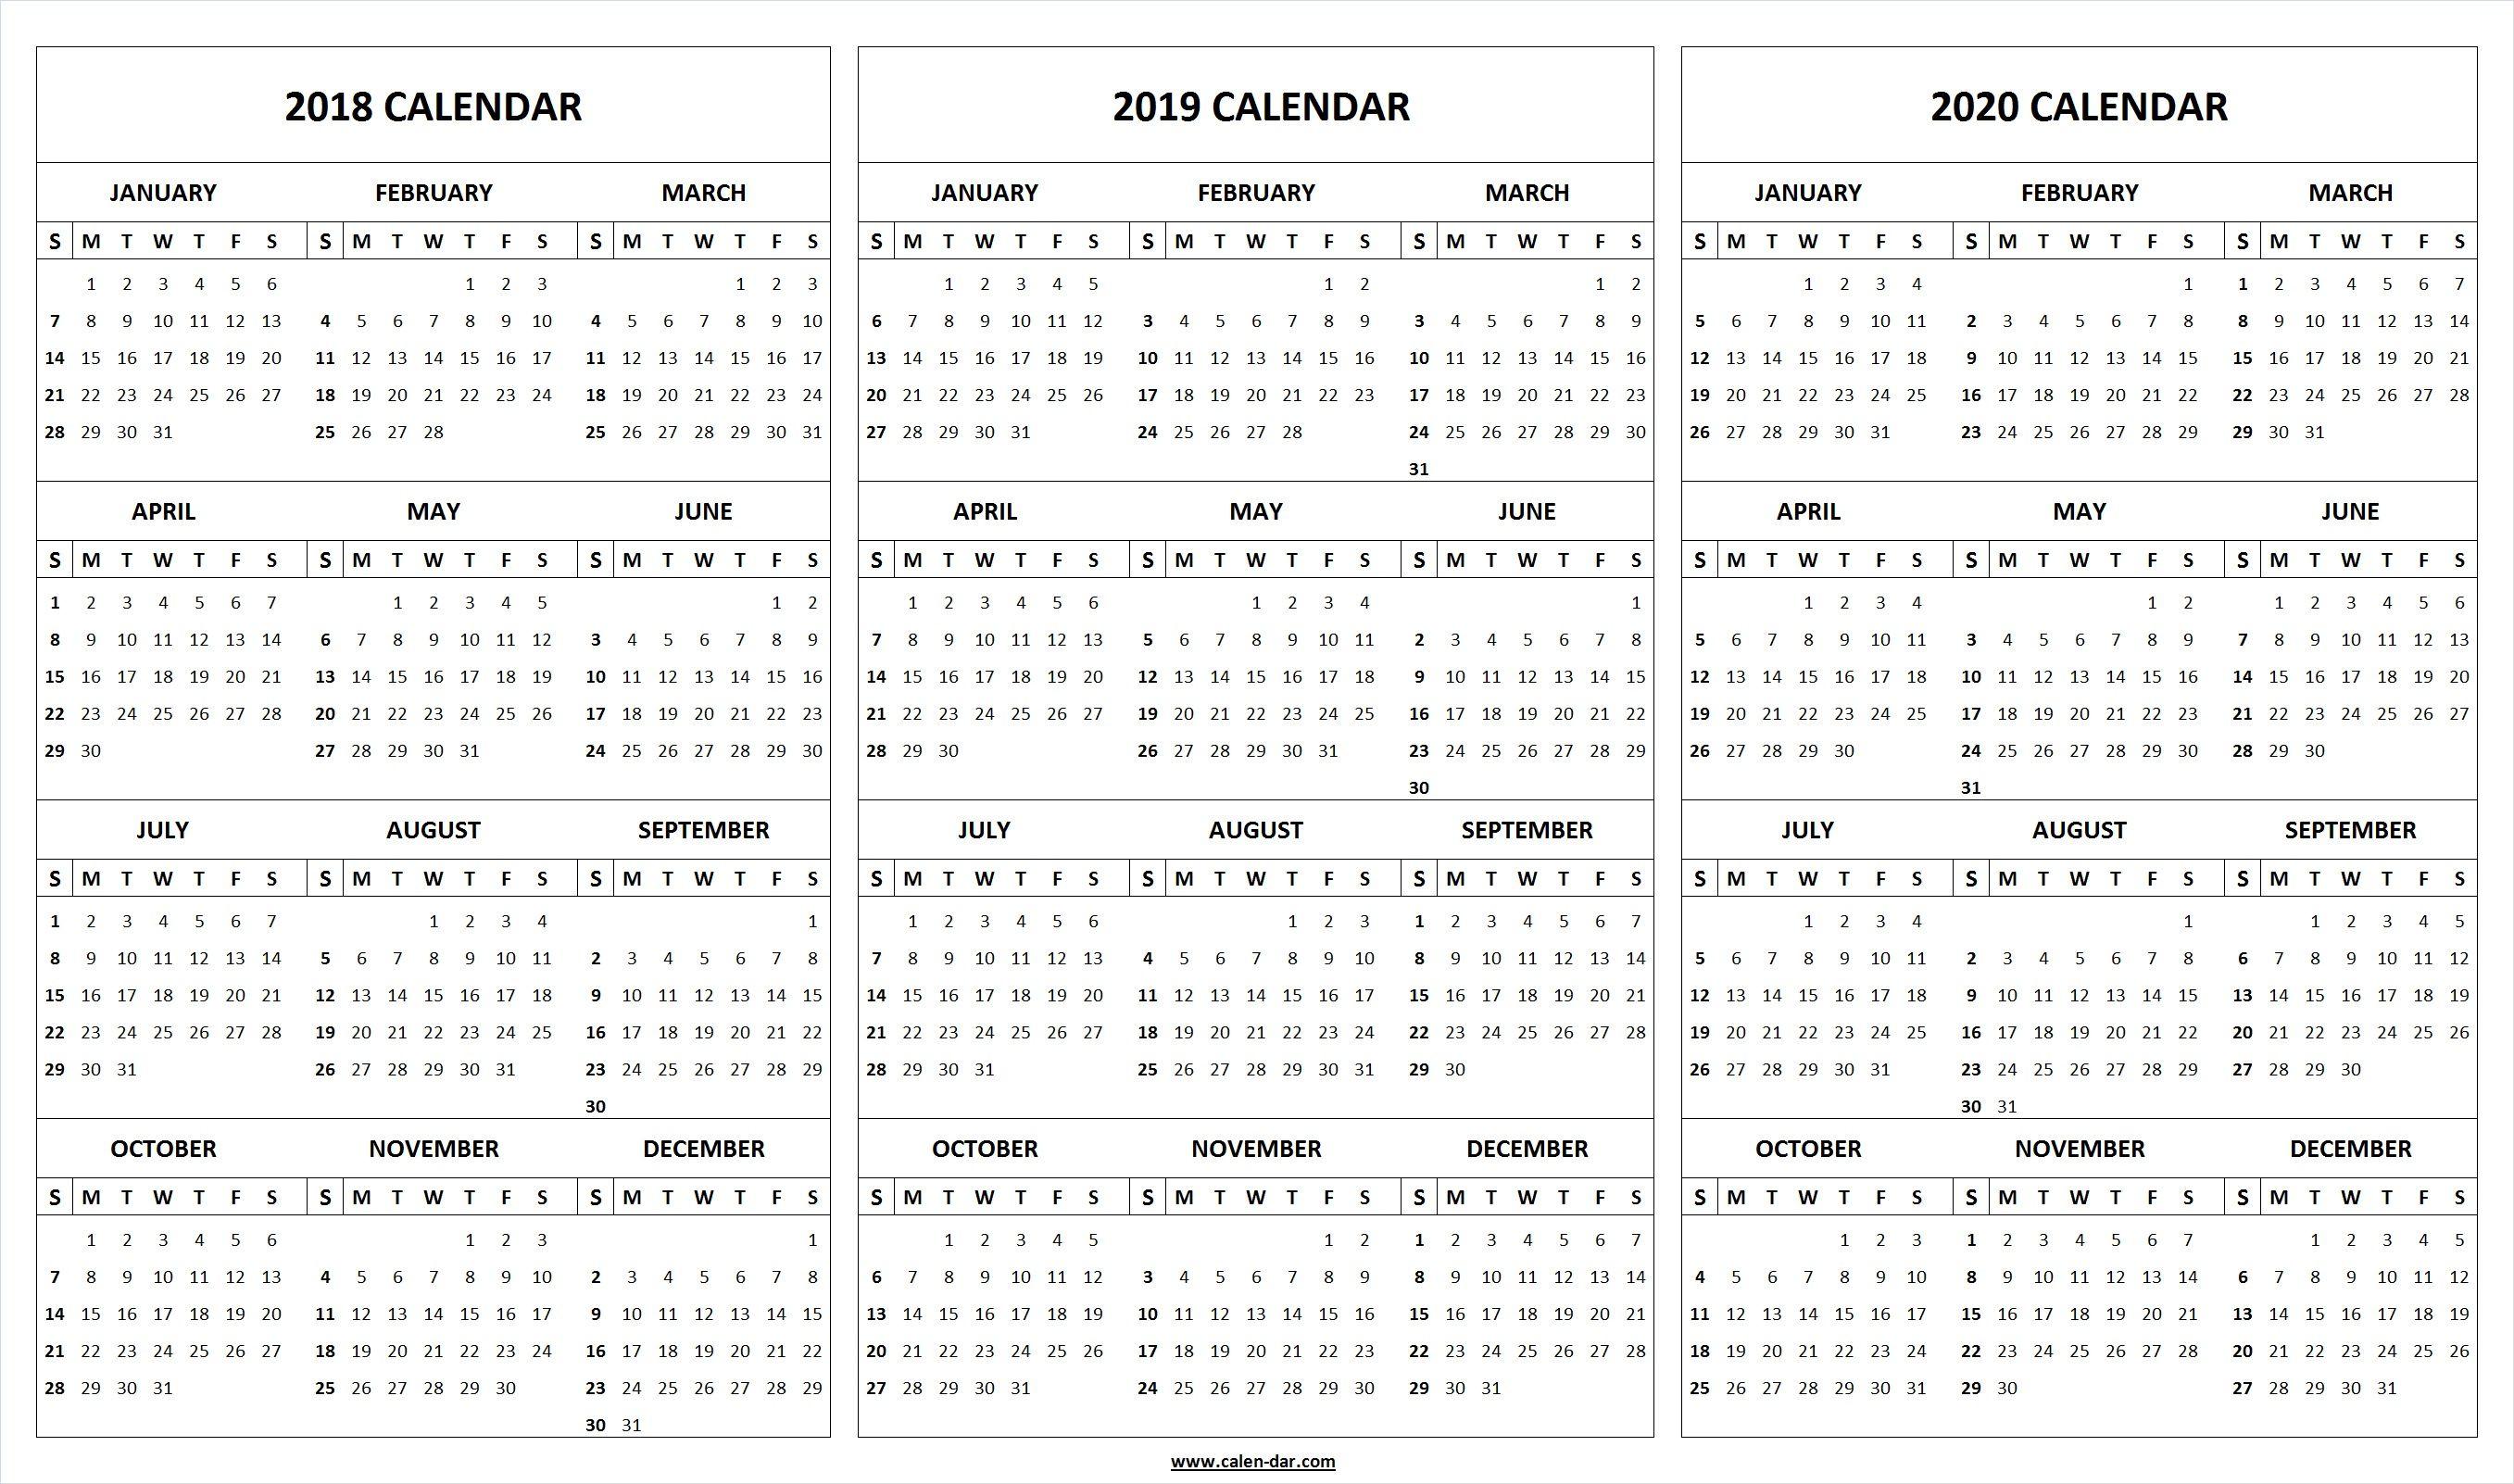 Print Blank 2018 2019 2020 Calendar Template   Organize!   2019 inside Calendar 2019 2020 With Boxes